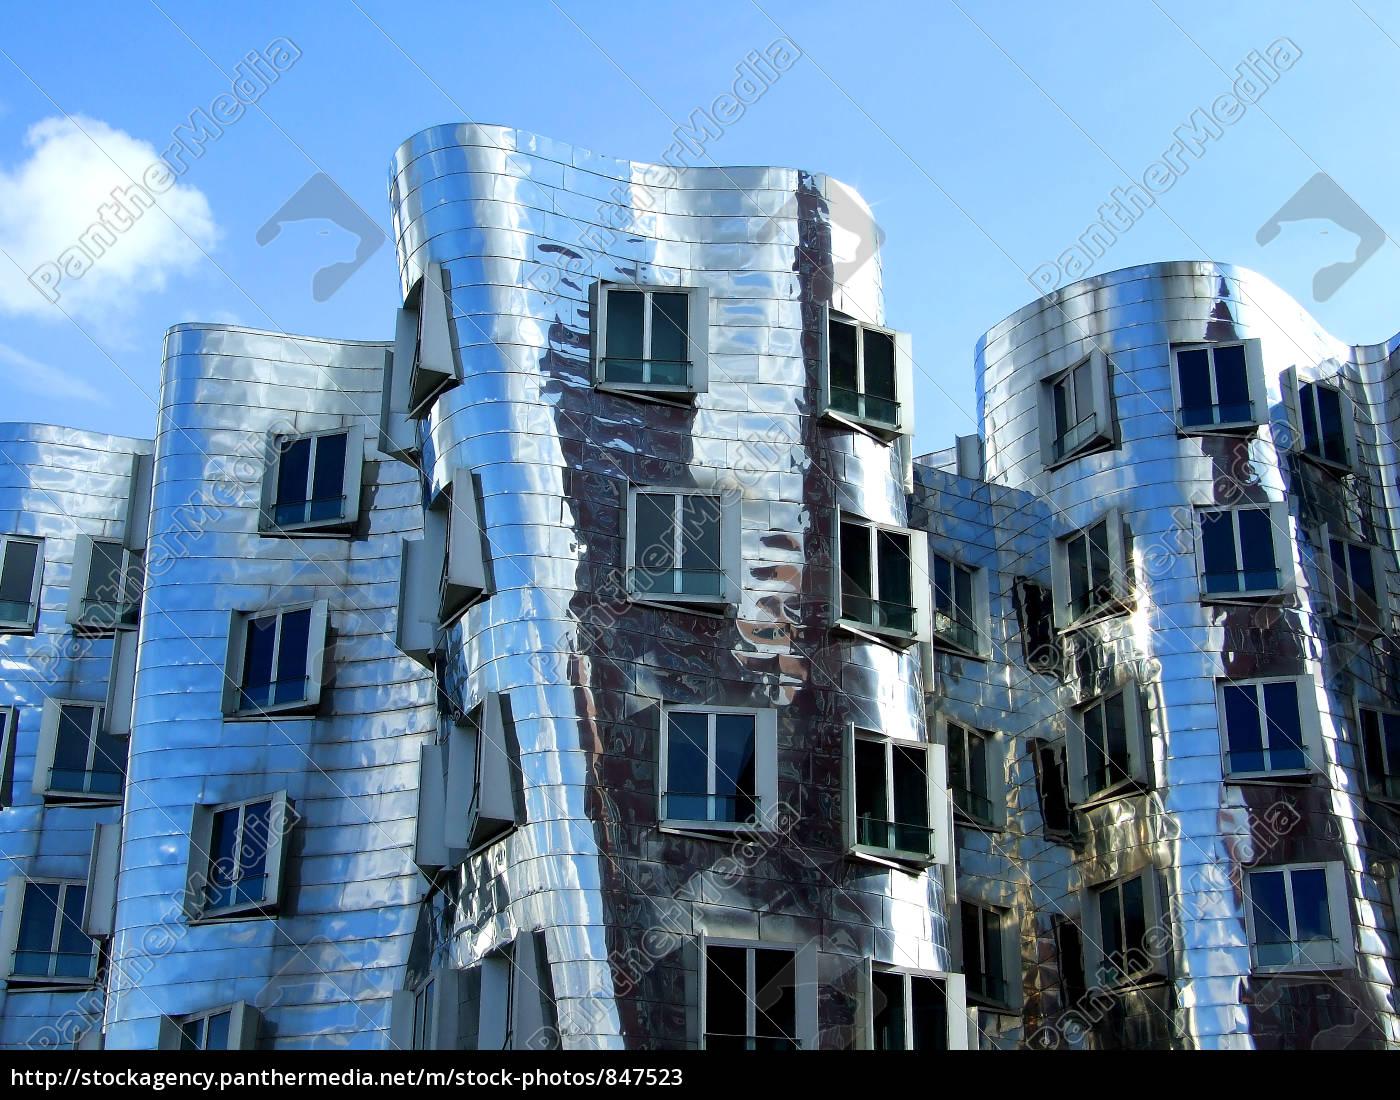 gehry, buildings, düsseldorf, iv - 847523